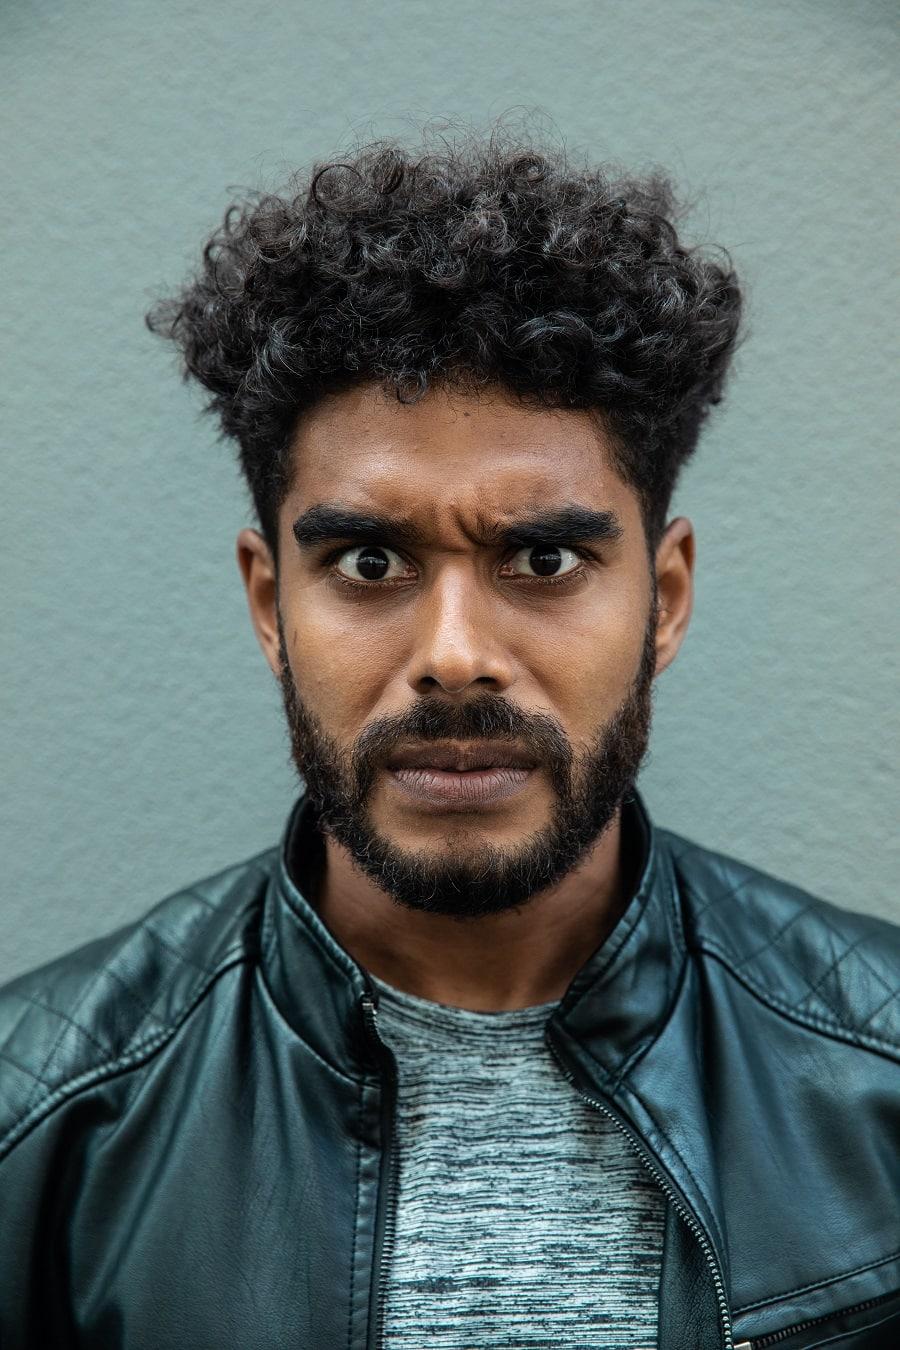 short beard with afro hair